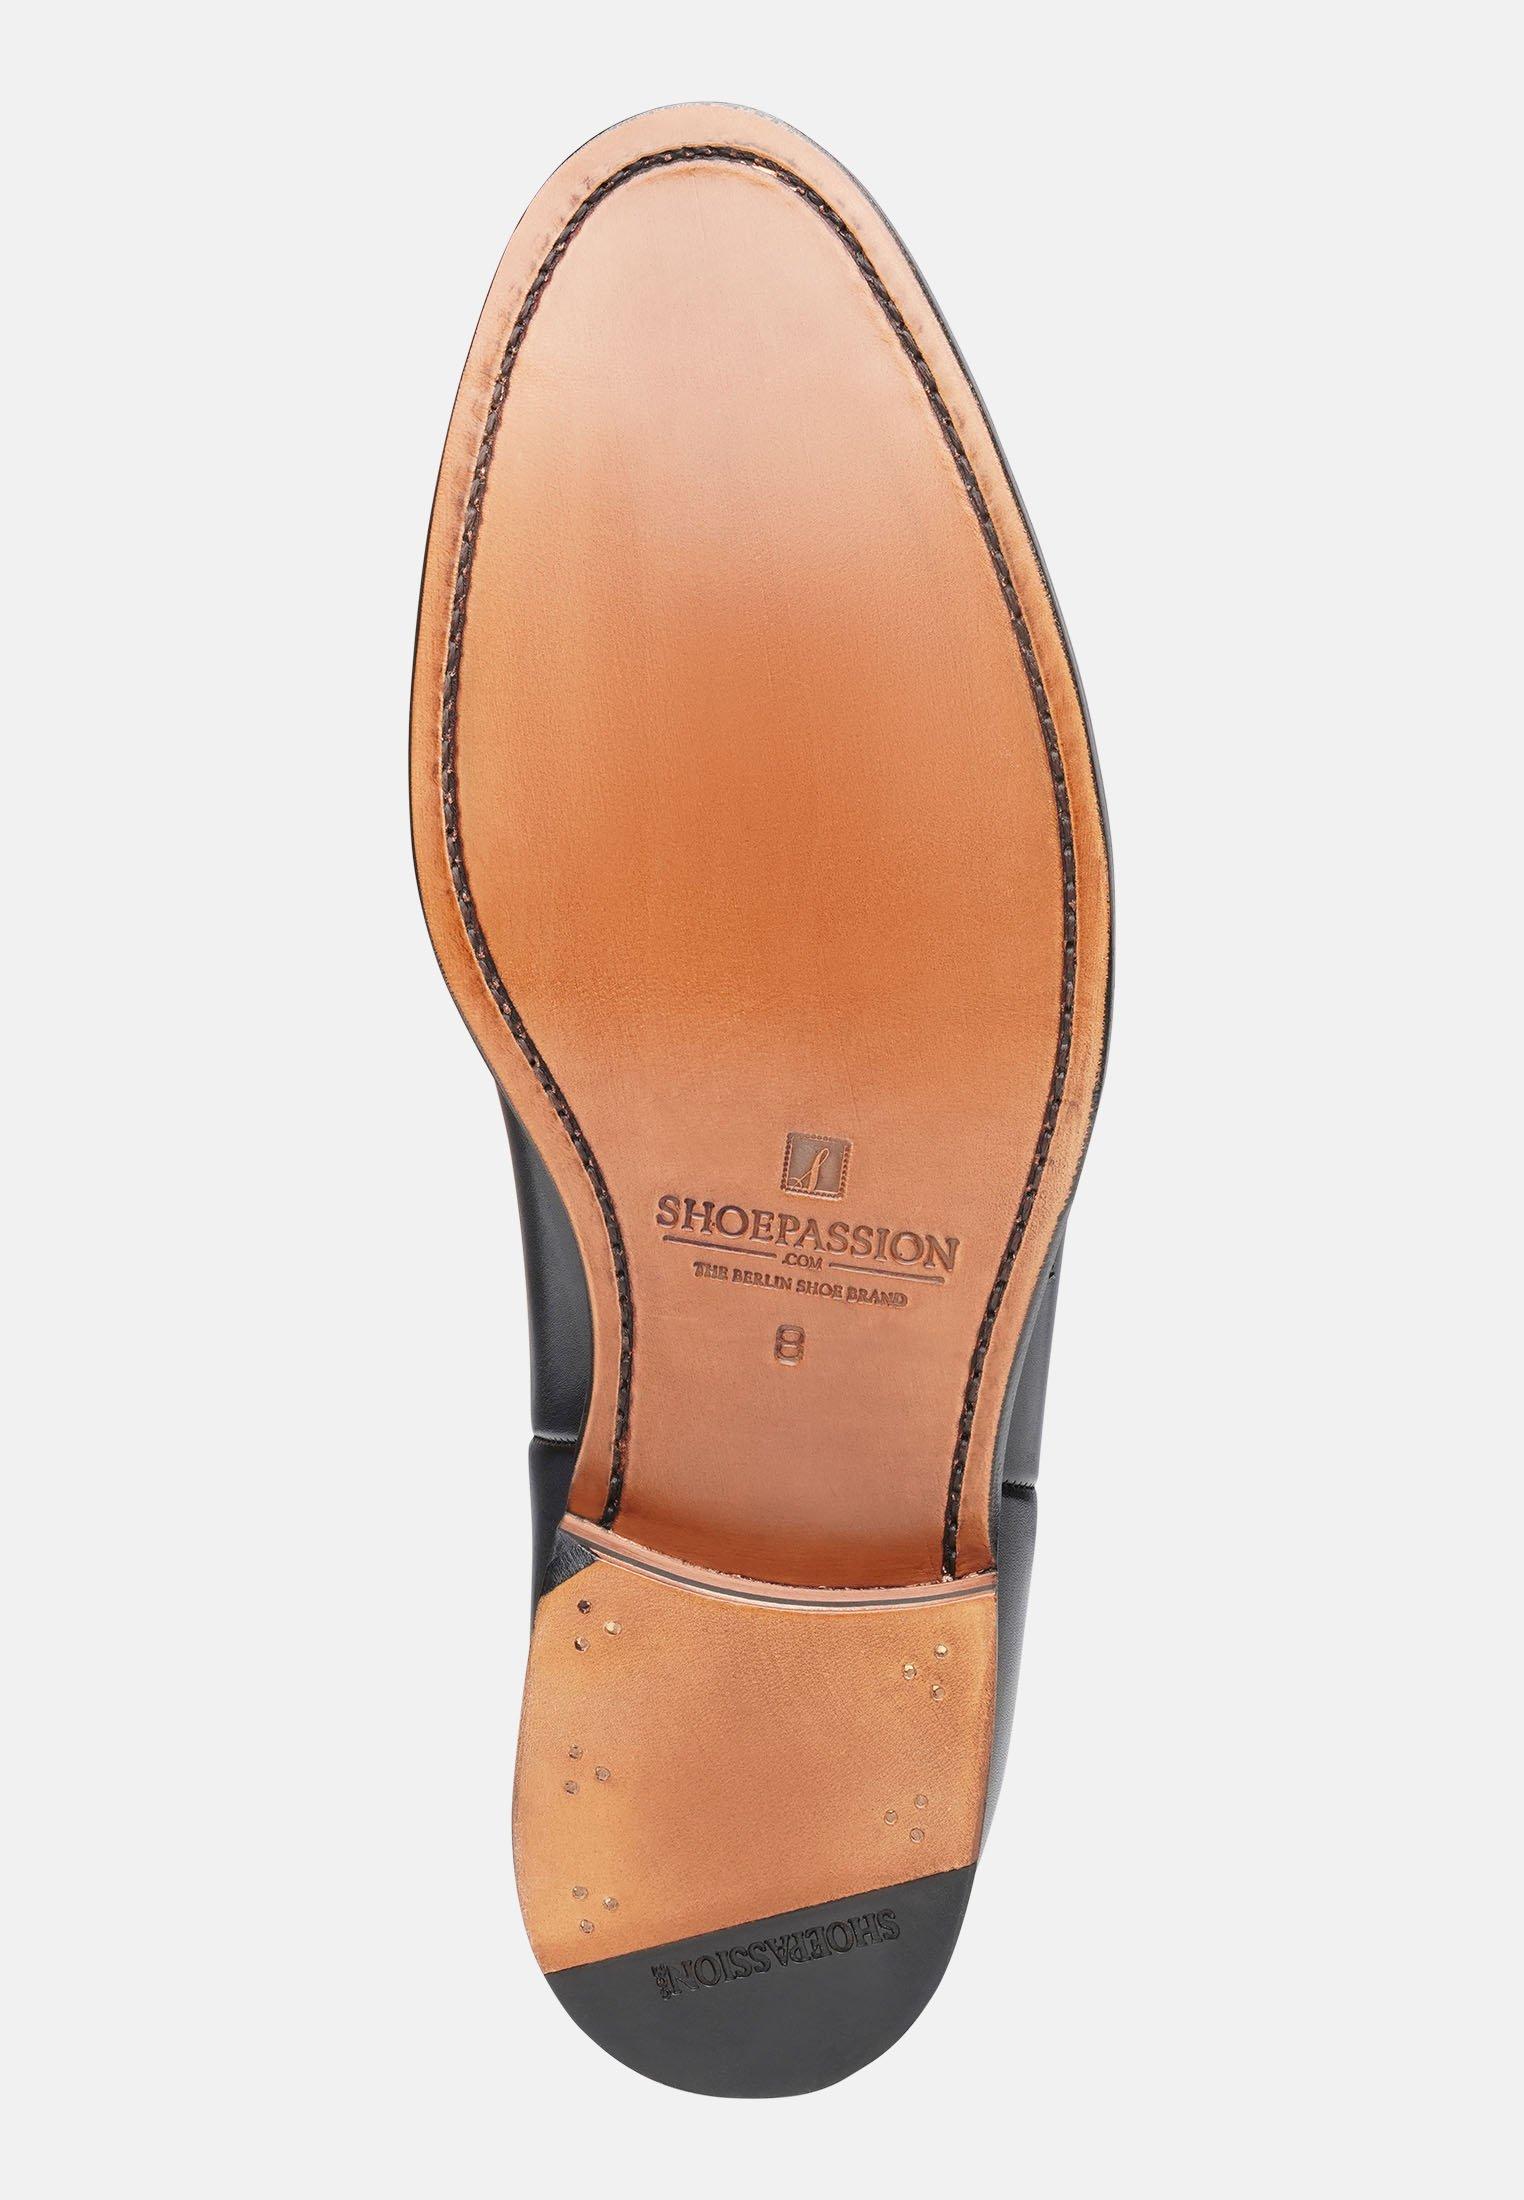 Shoepassion Stivaletti - Black